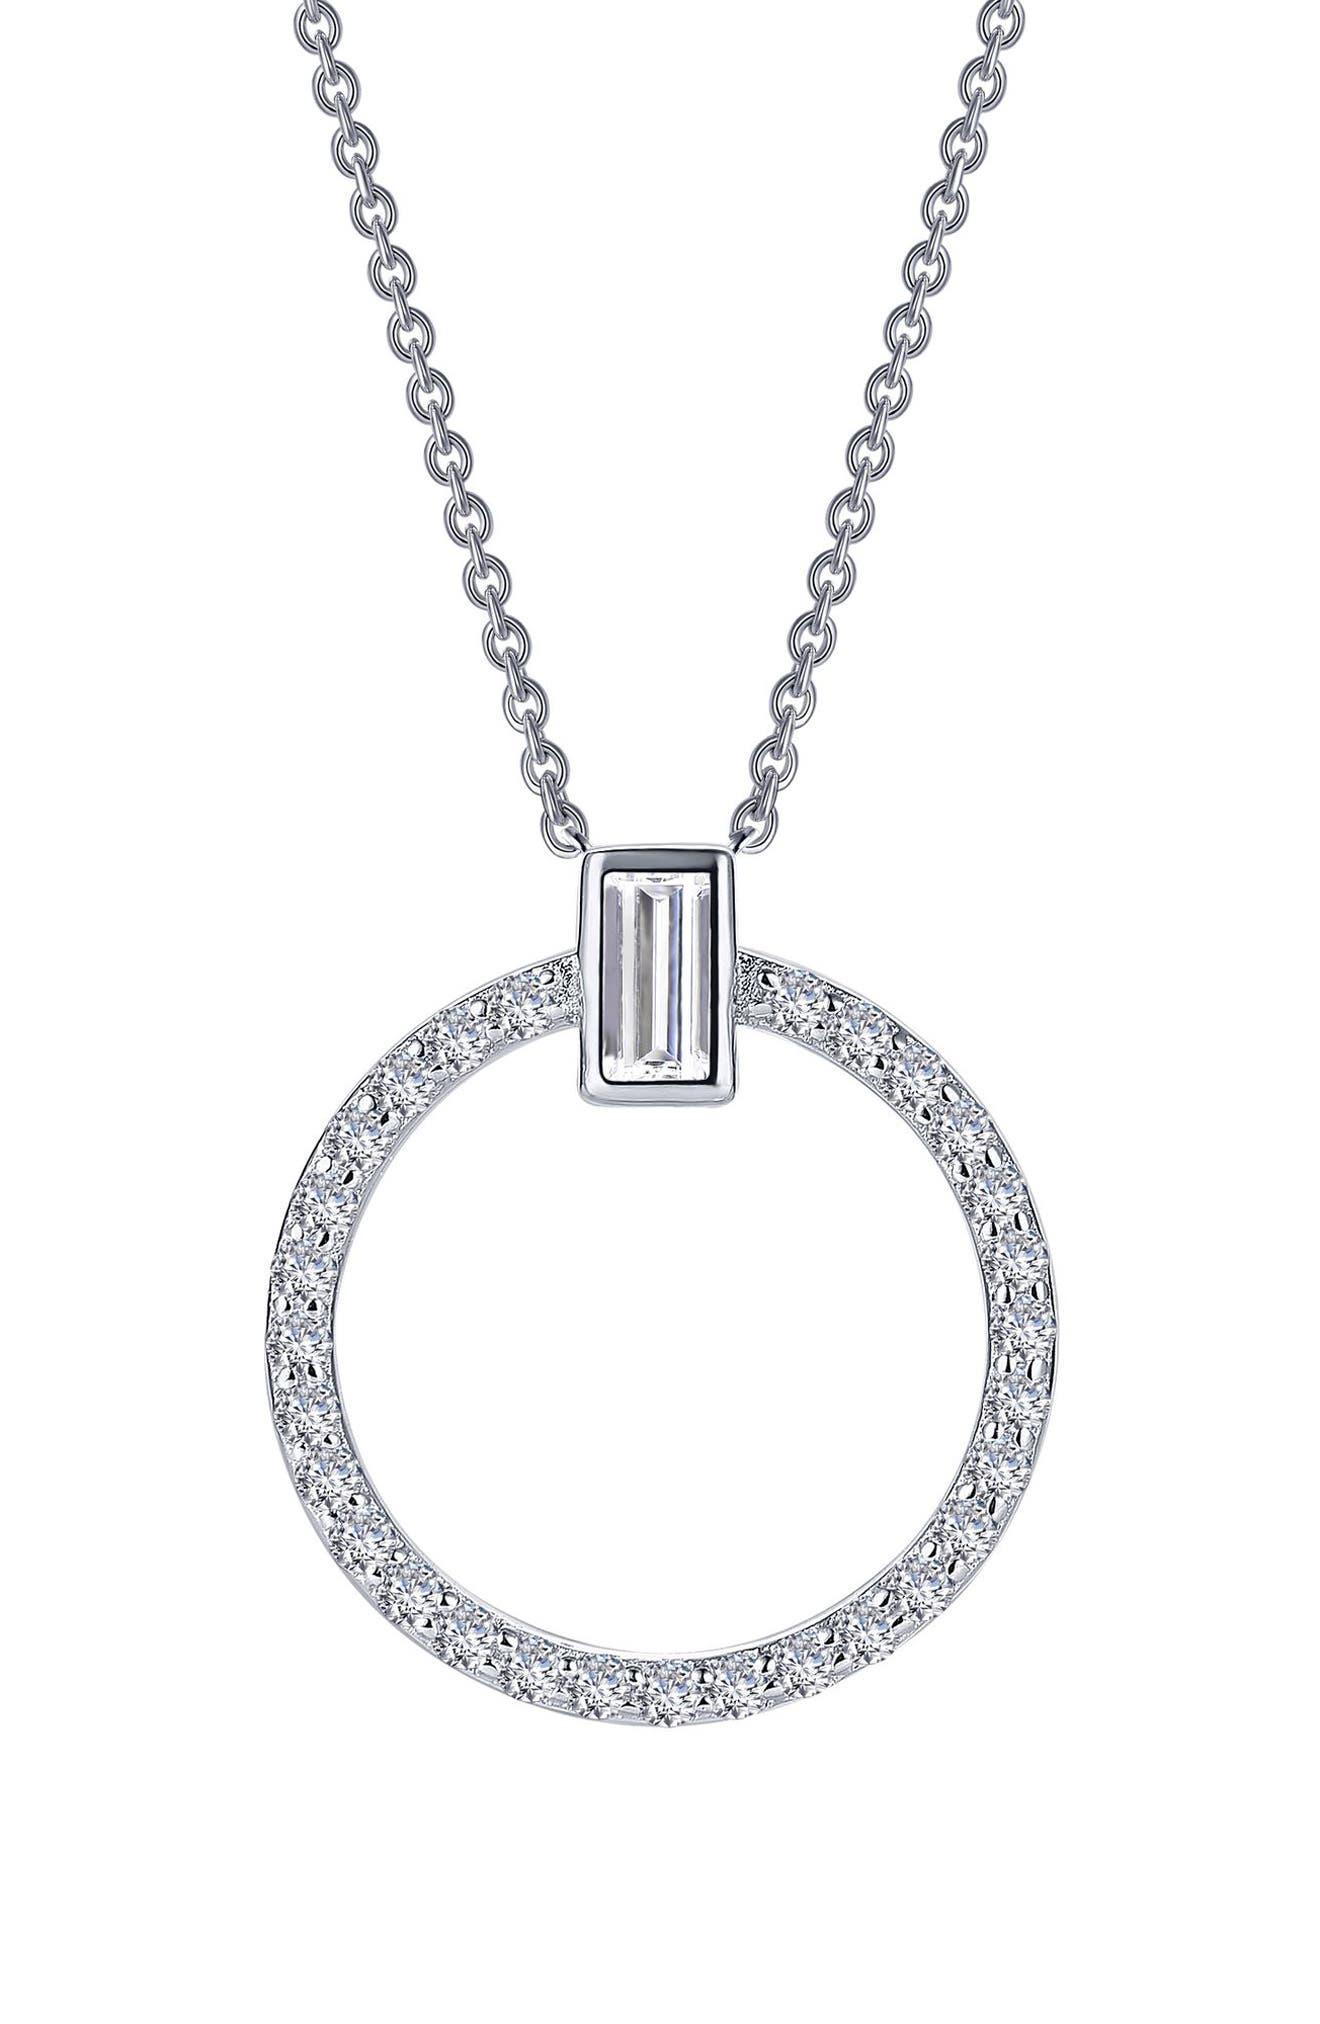 Simulated Diamond Open Circle Pendant Necklace